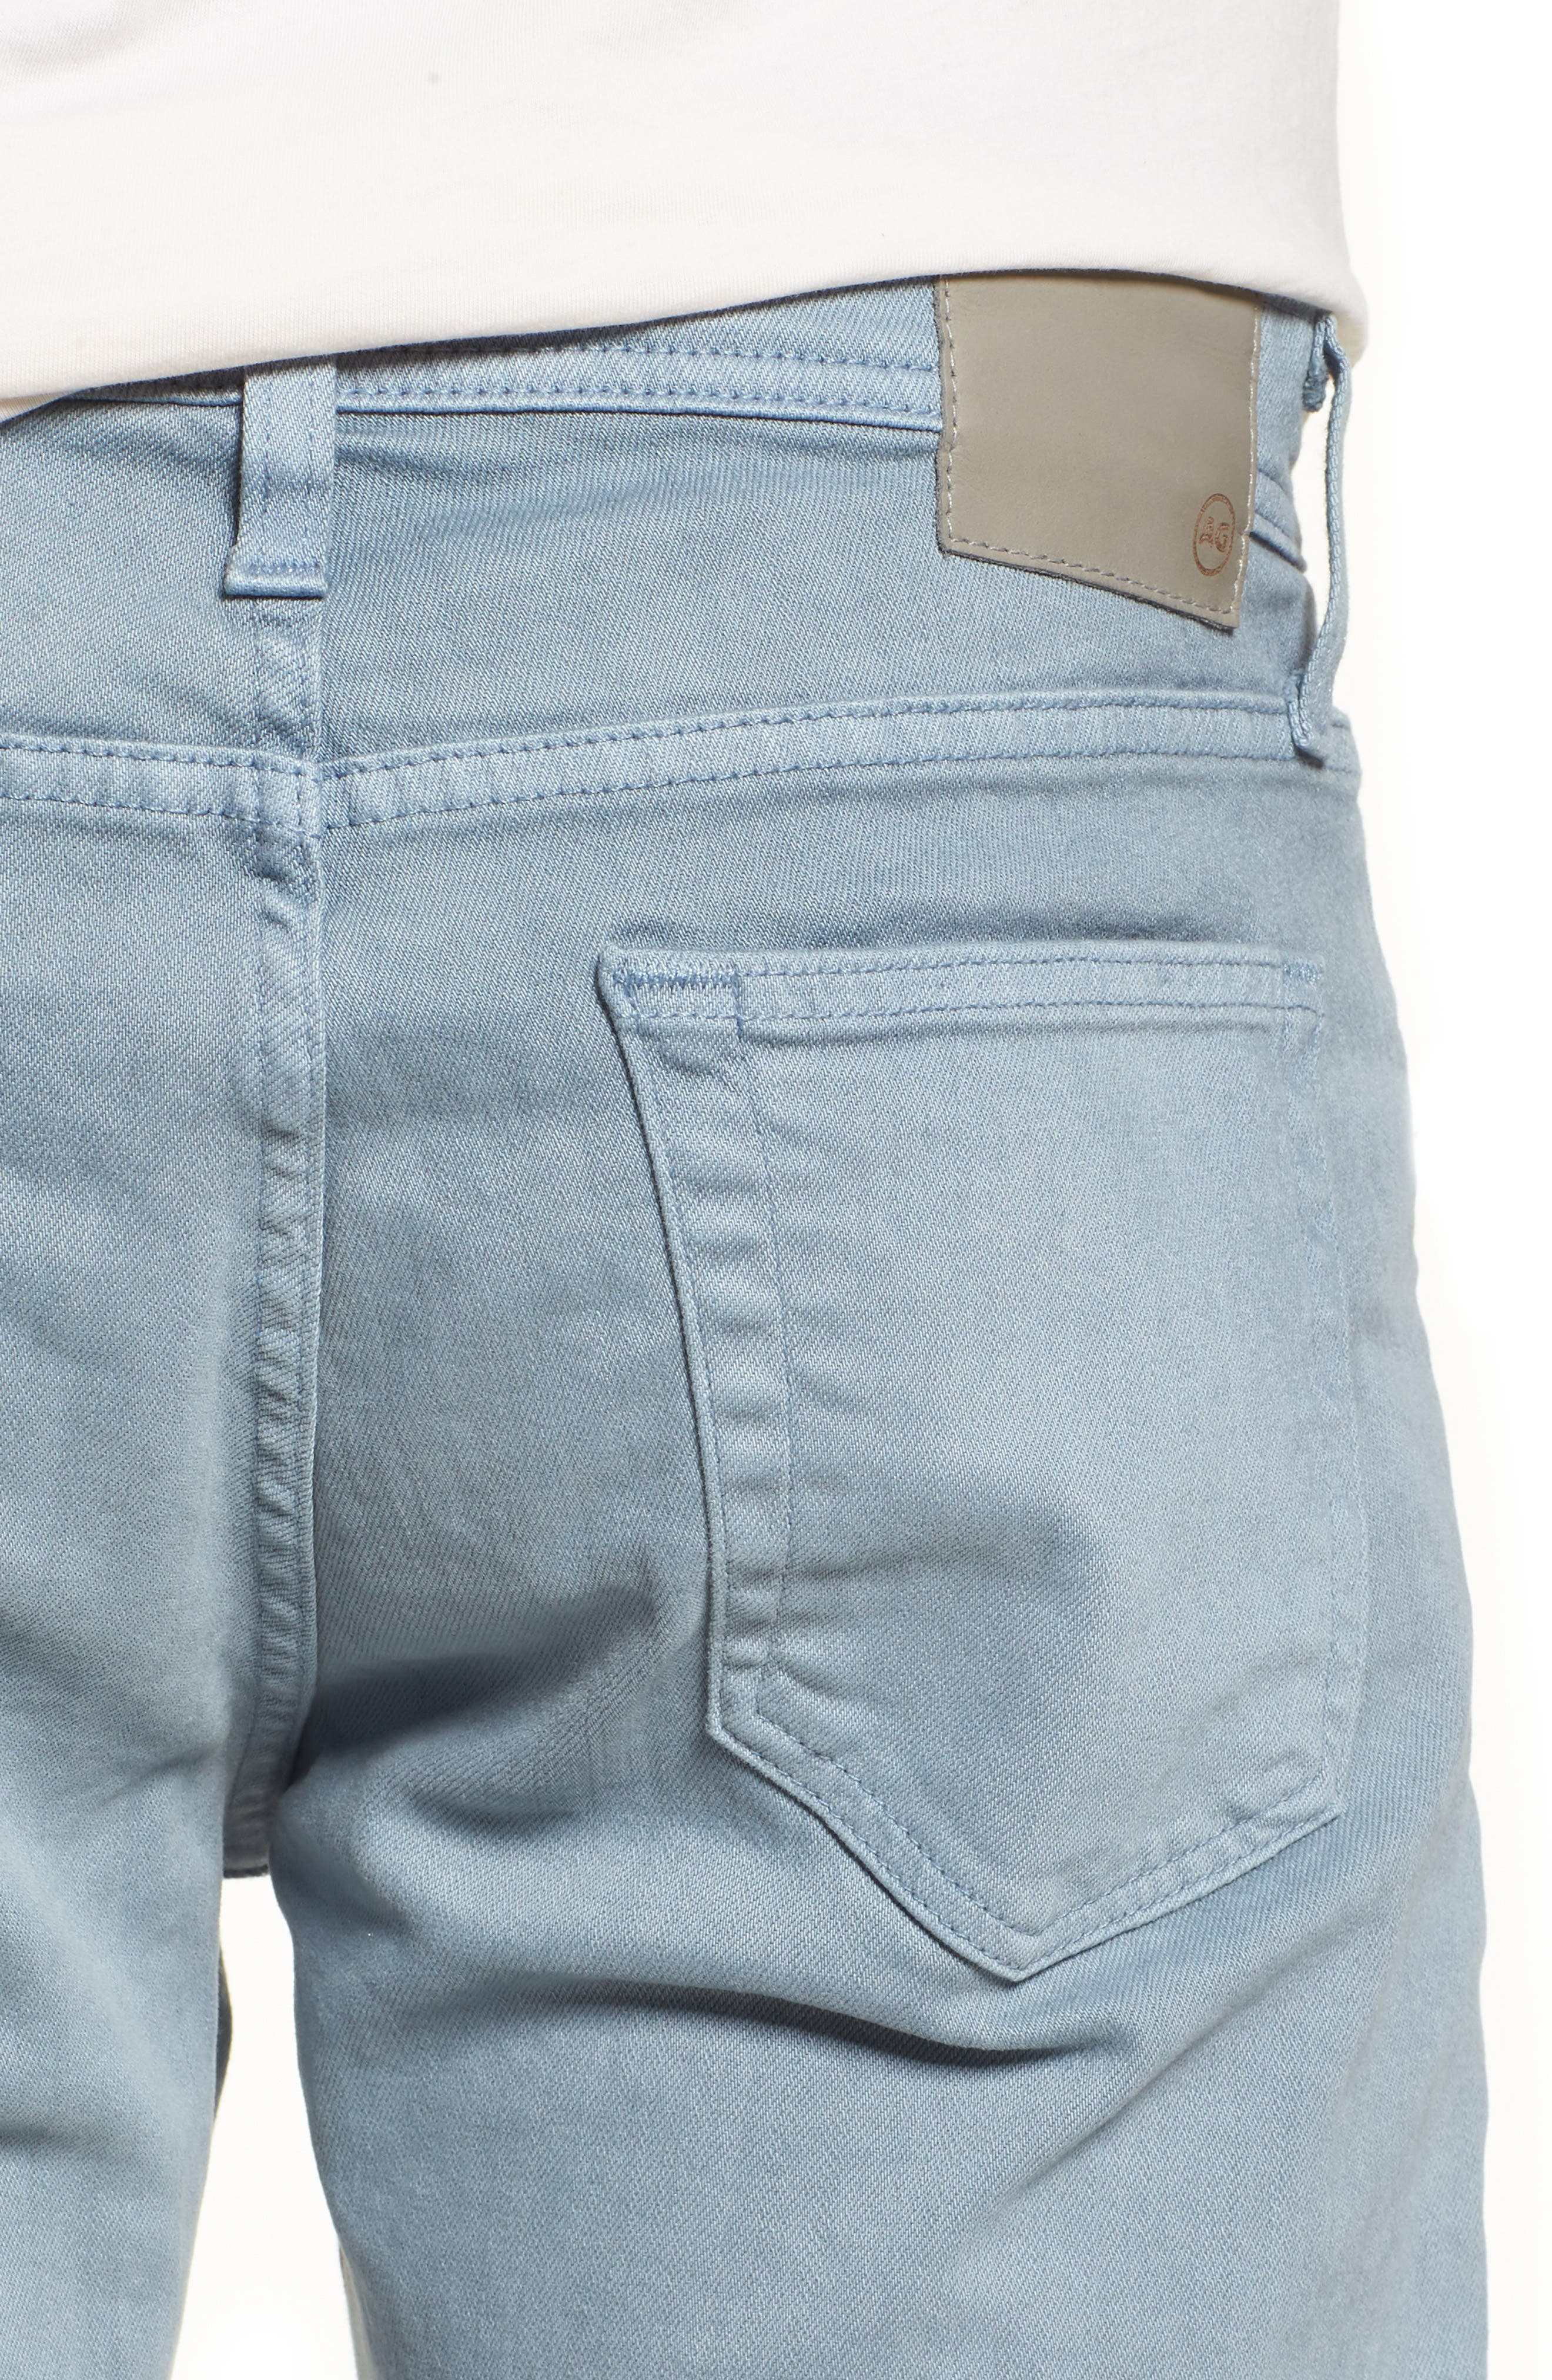 Tellis Slim Fit Jeans,                             Alternate thumbnail 4, color,                             480